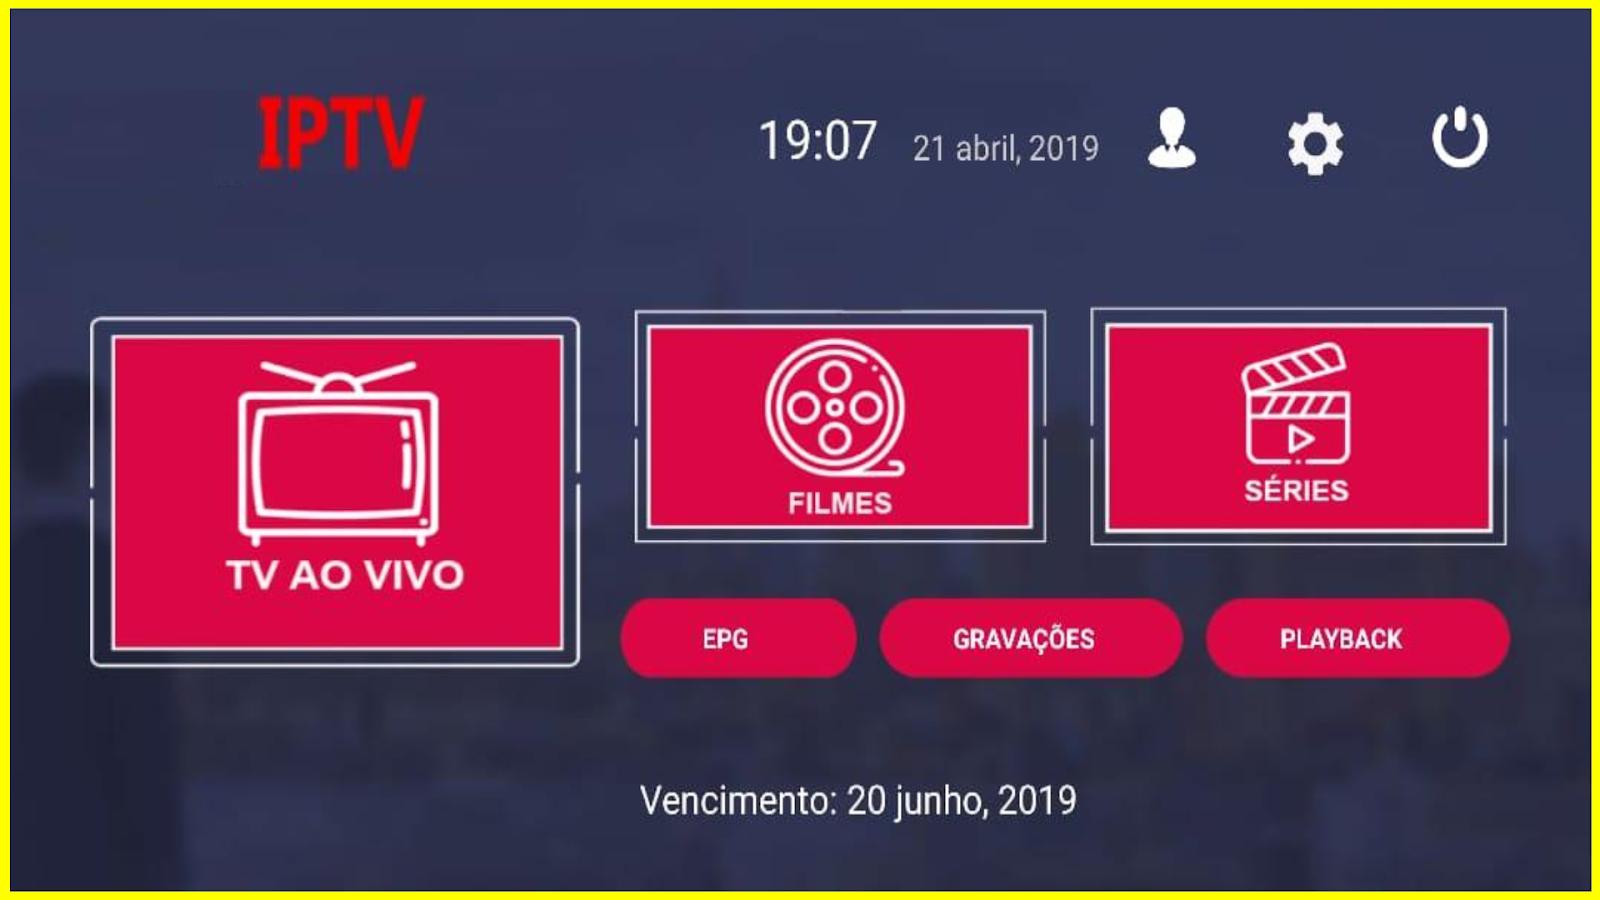 ✨ Live iptv apk 2019 | Android industrieit net2 5 IPTV Apk